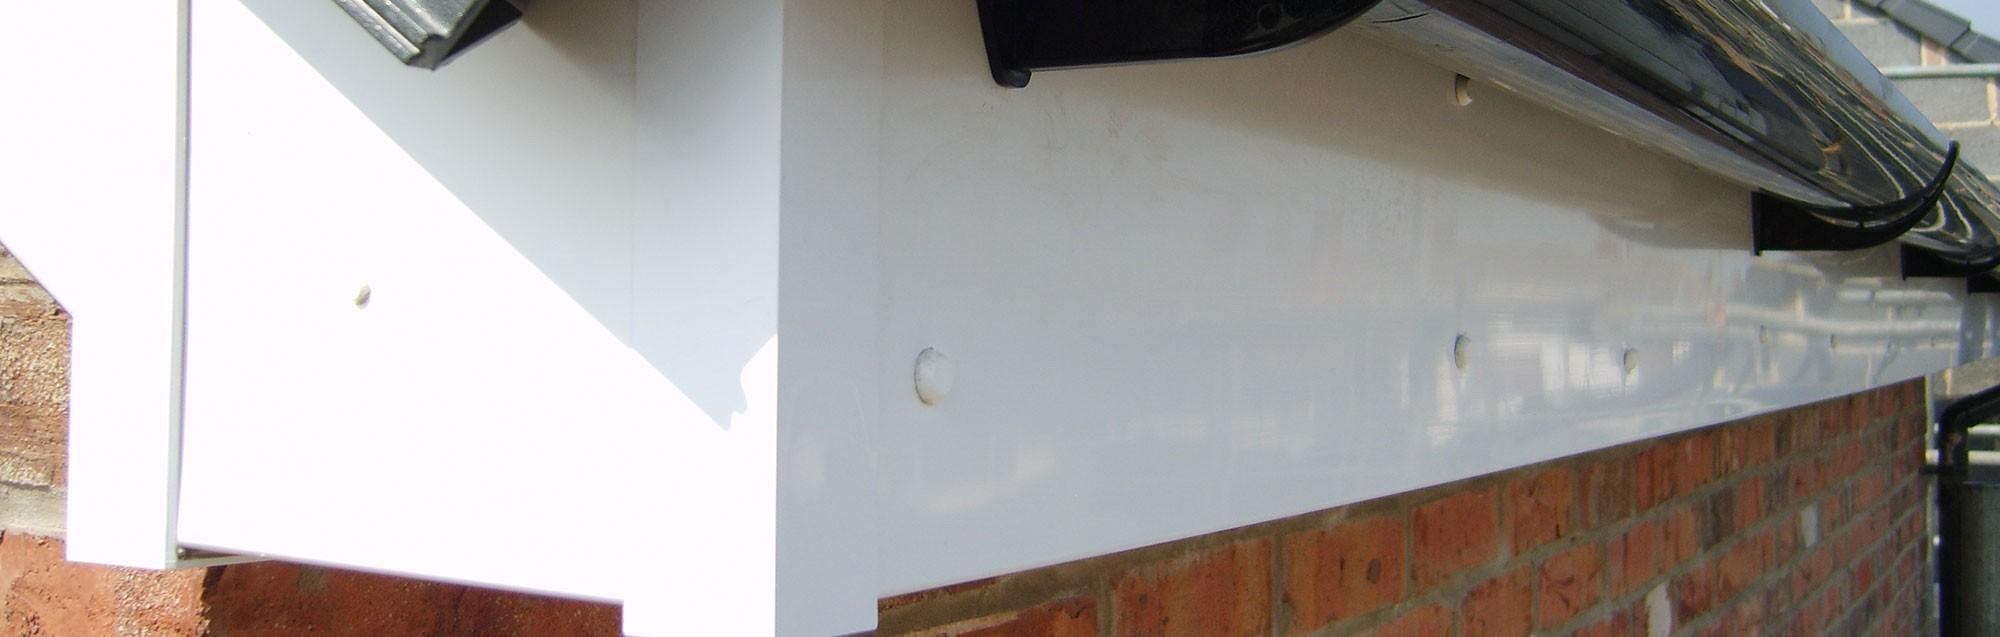 Upvc Fascias Amp Soffits Roofline Specialists Edinburgh